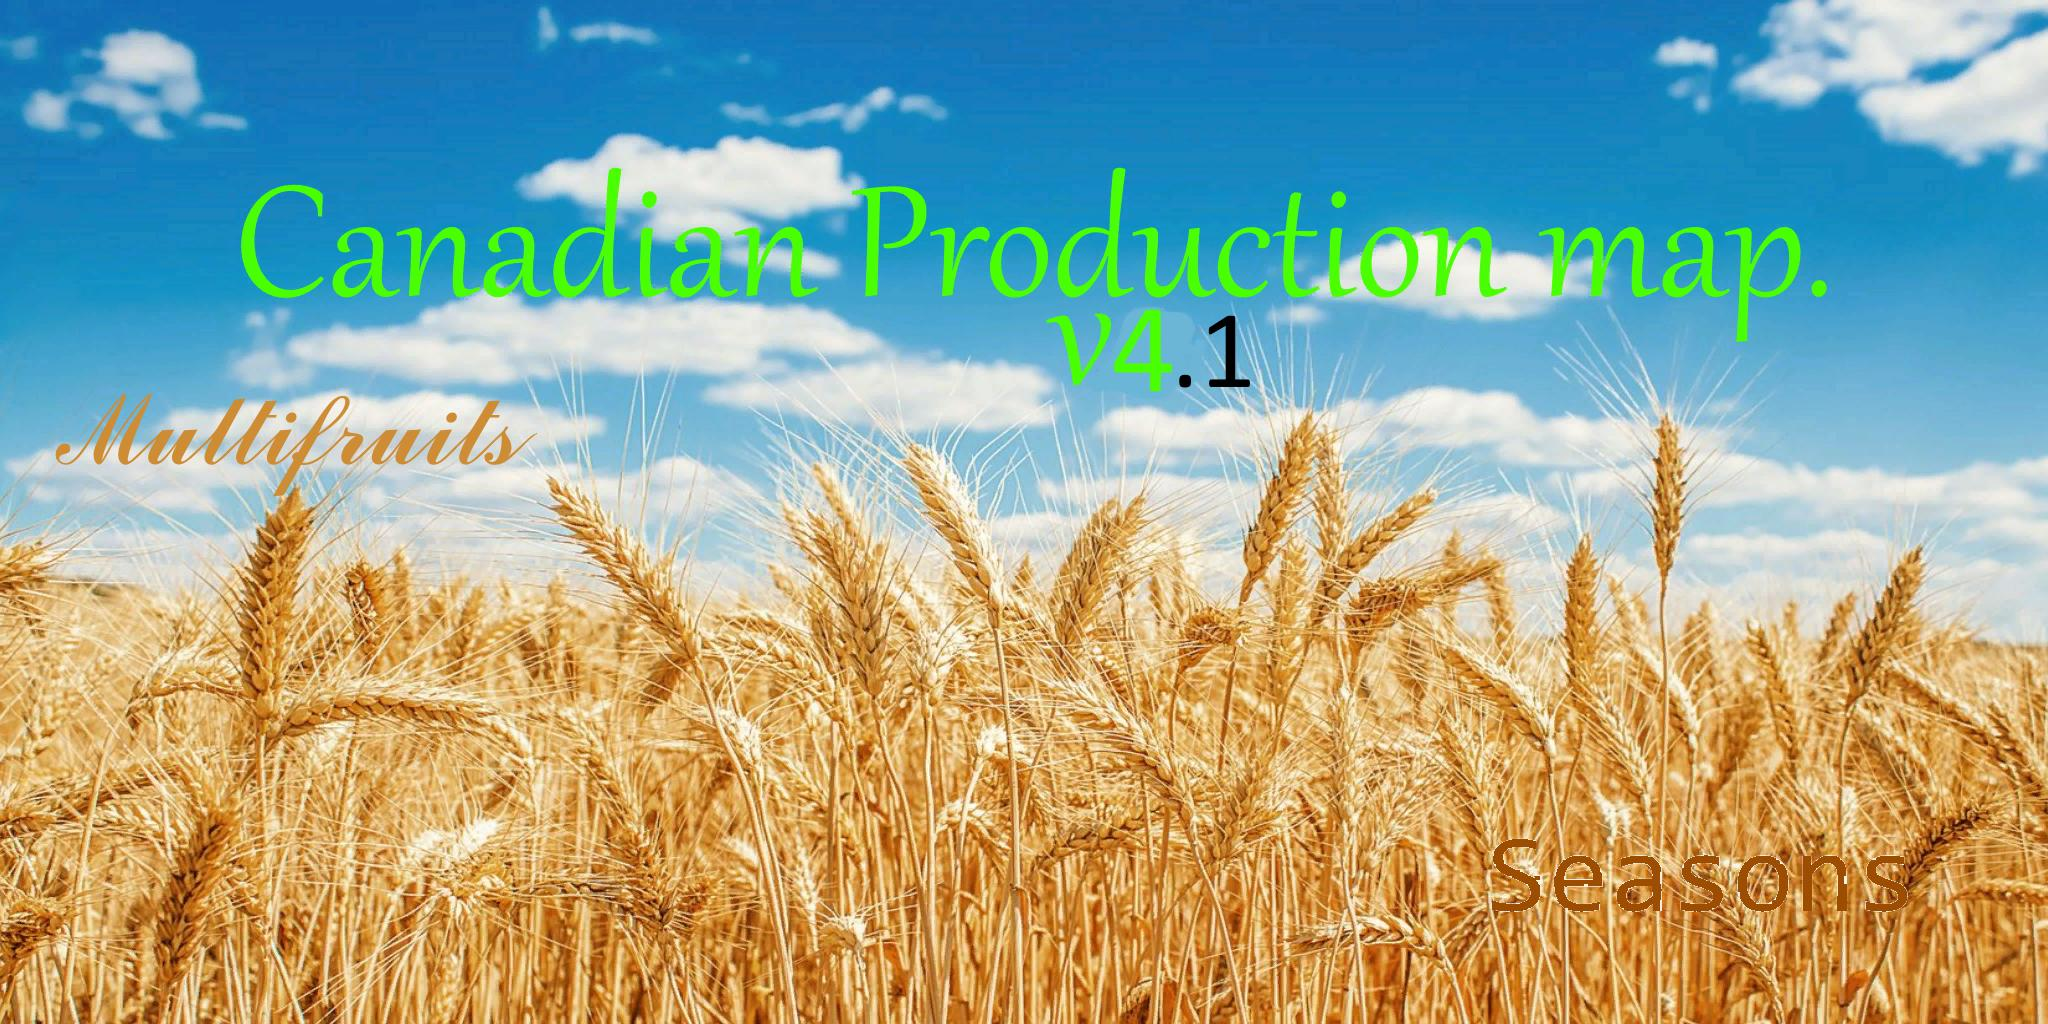 FS19 - Canadian Production Map V4.1